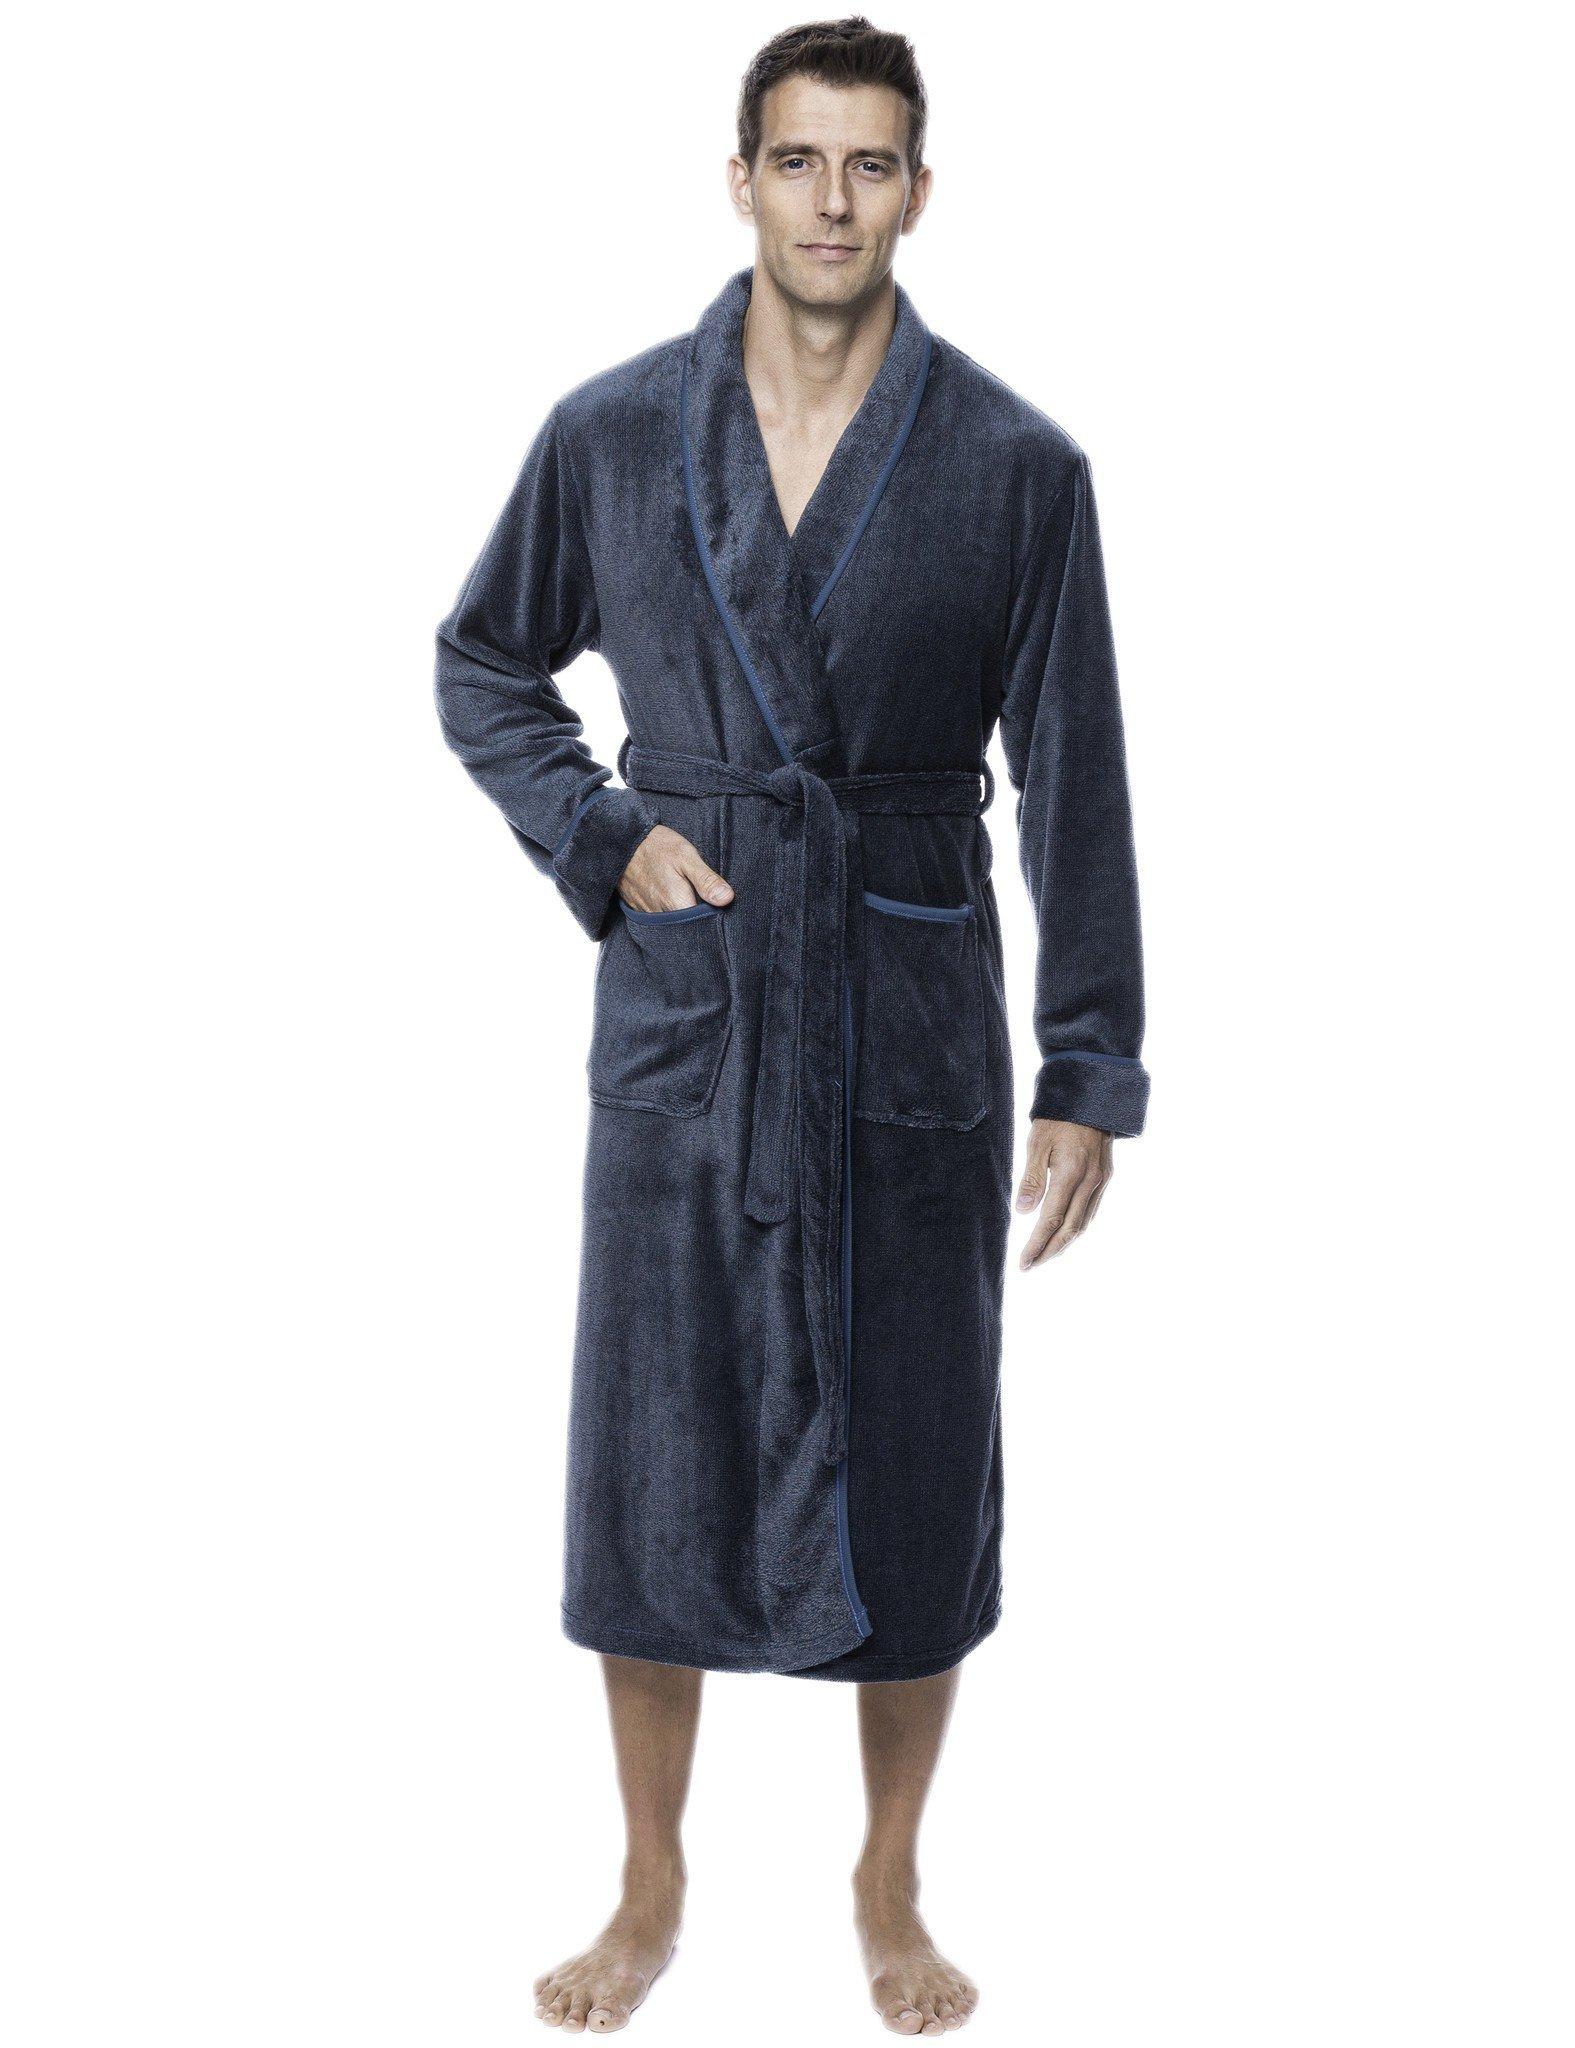 Mens Premium Coral Fleece Plush Spa/Bath Robe - Marl Navy/Grey - 2XL/3XL